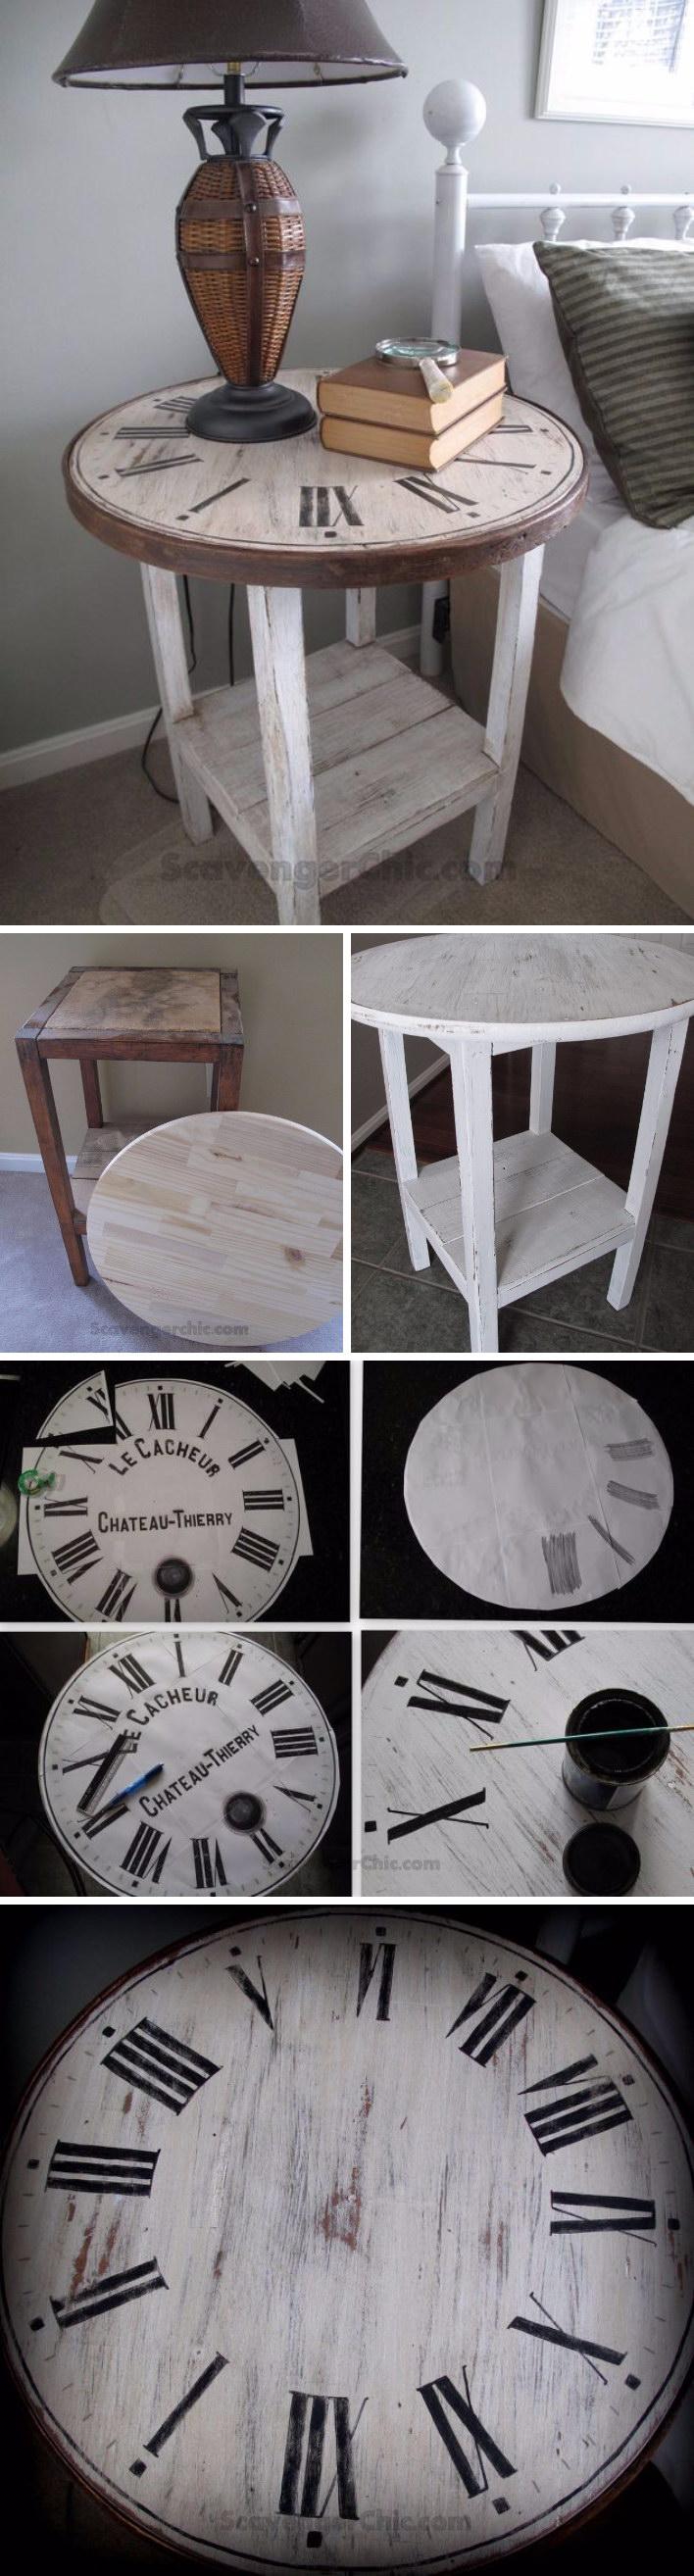 1-5-diy-side-table-ideas